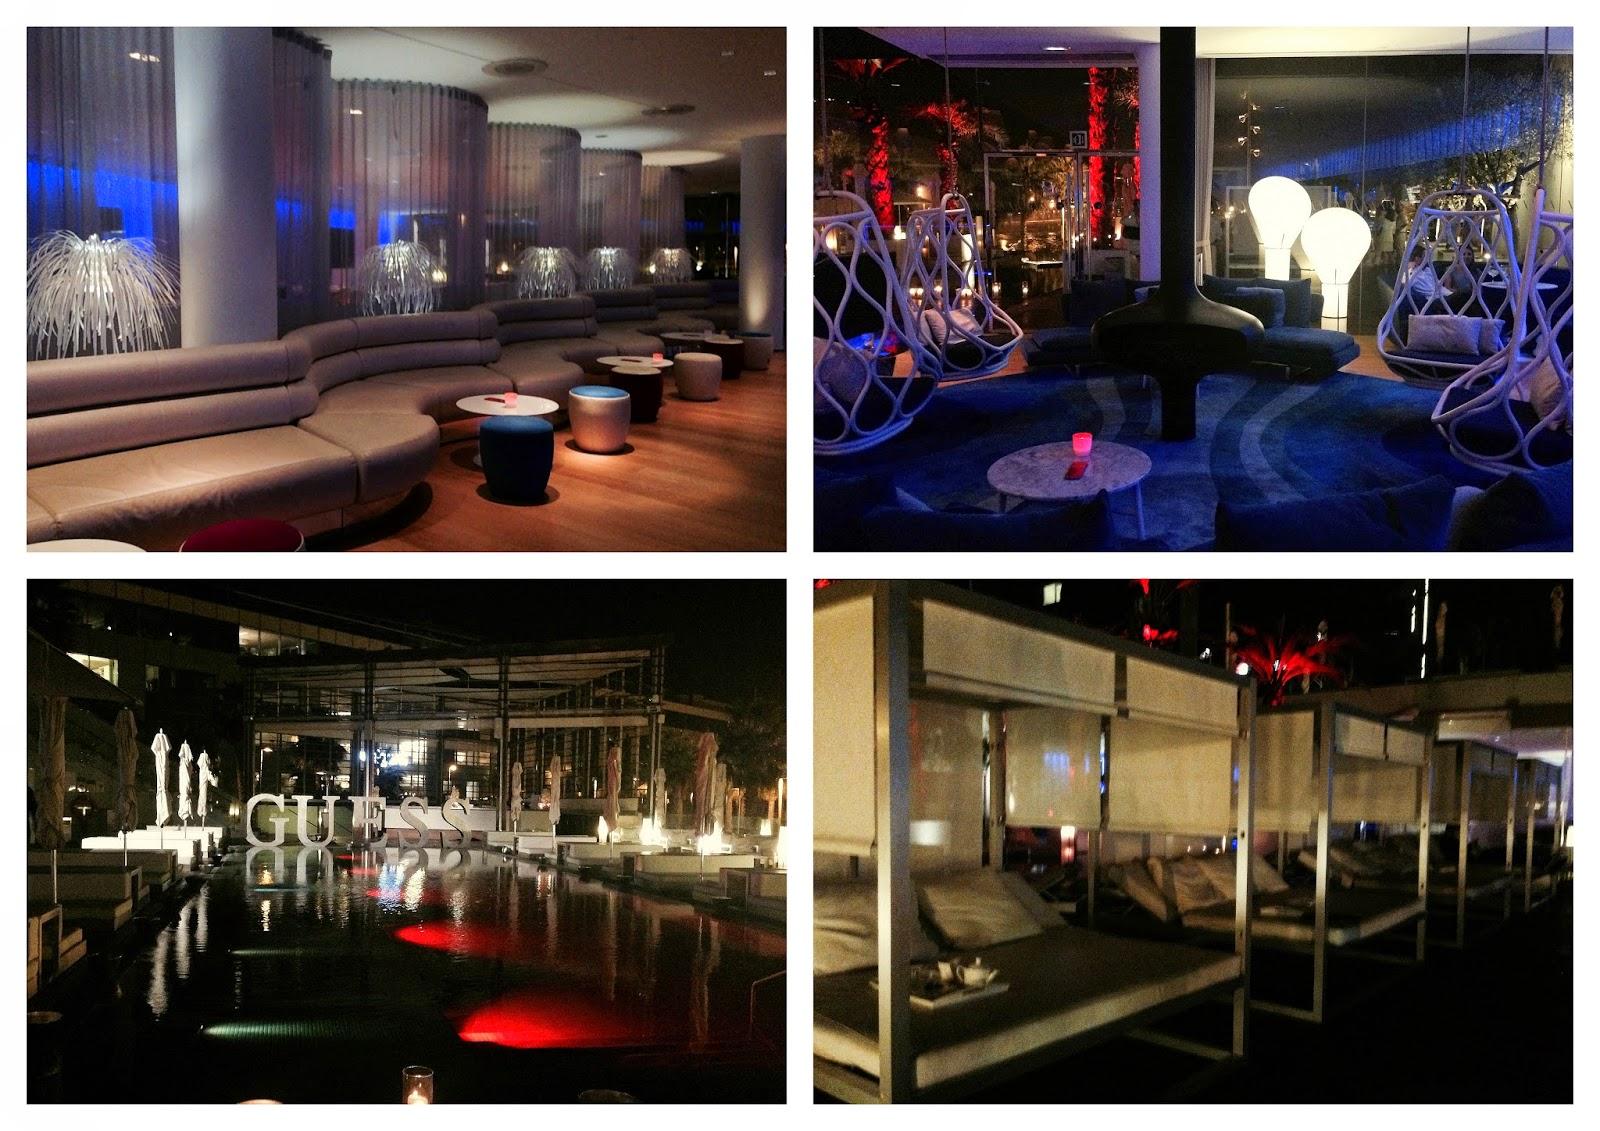 hotel w bcn magica barcelona discoteca guess